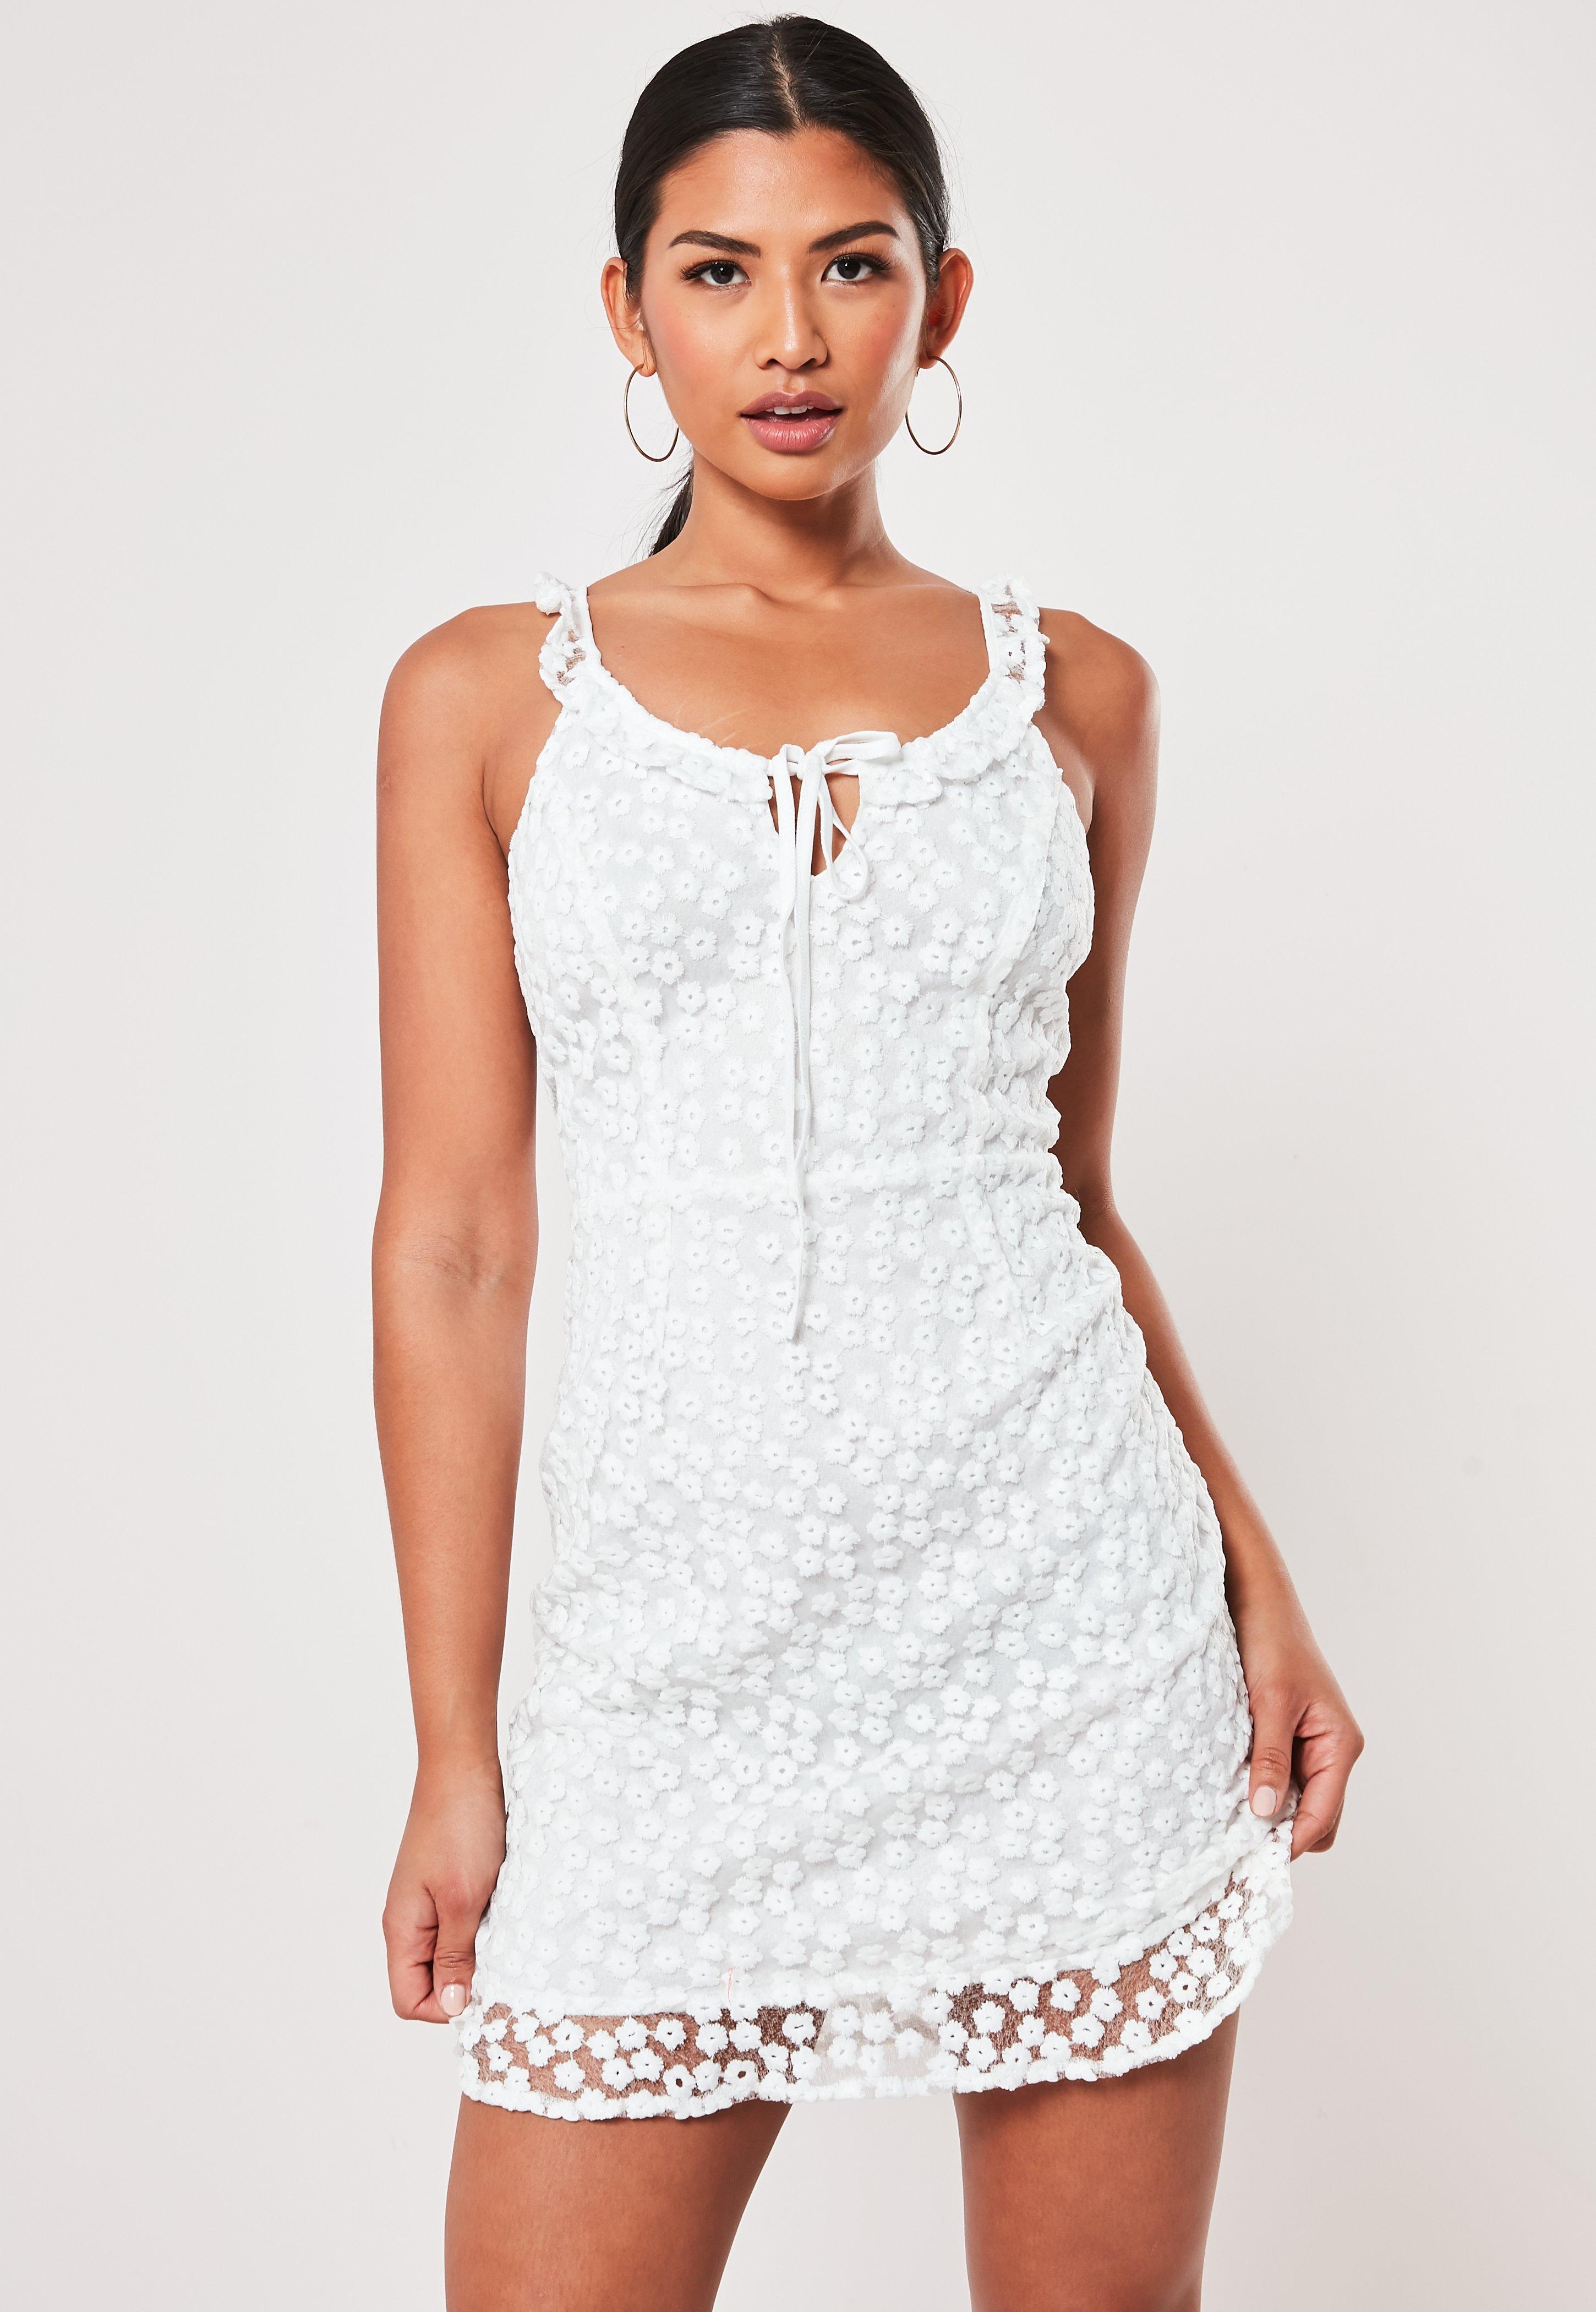 94d02cd2 Embellished Dresses - Glitter & Beaded Dresses | Missguided